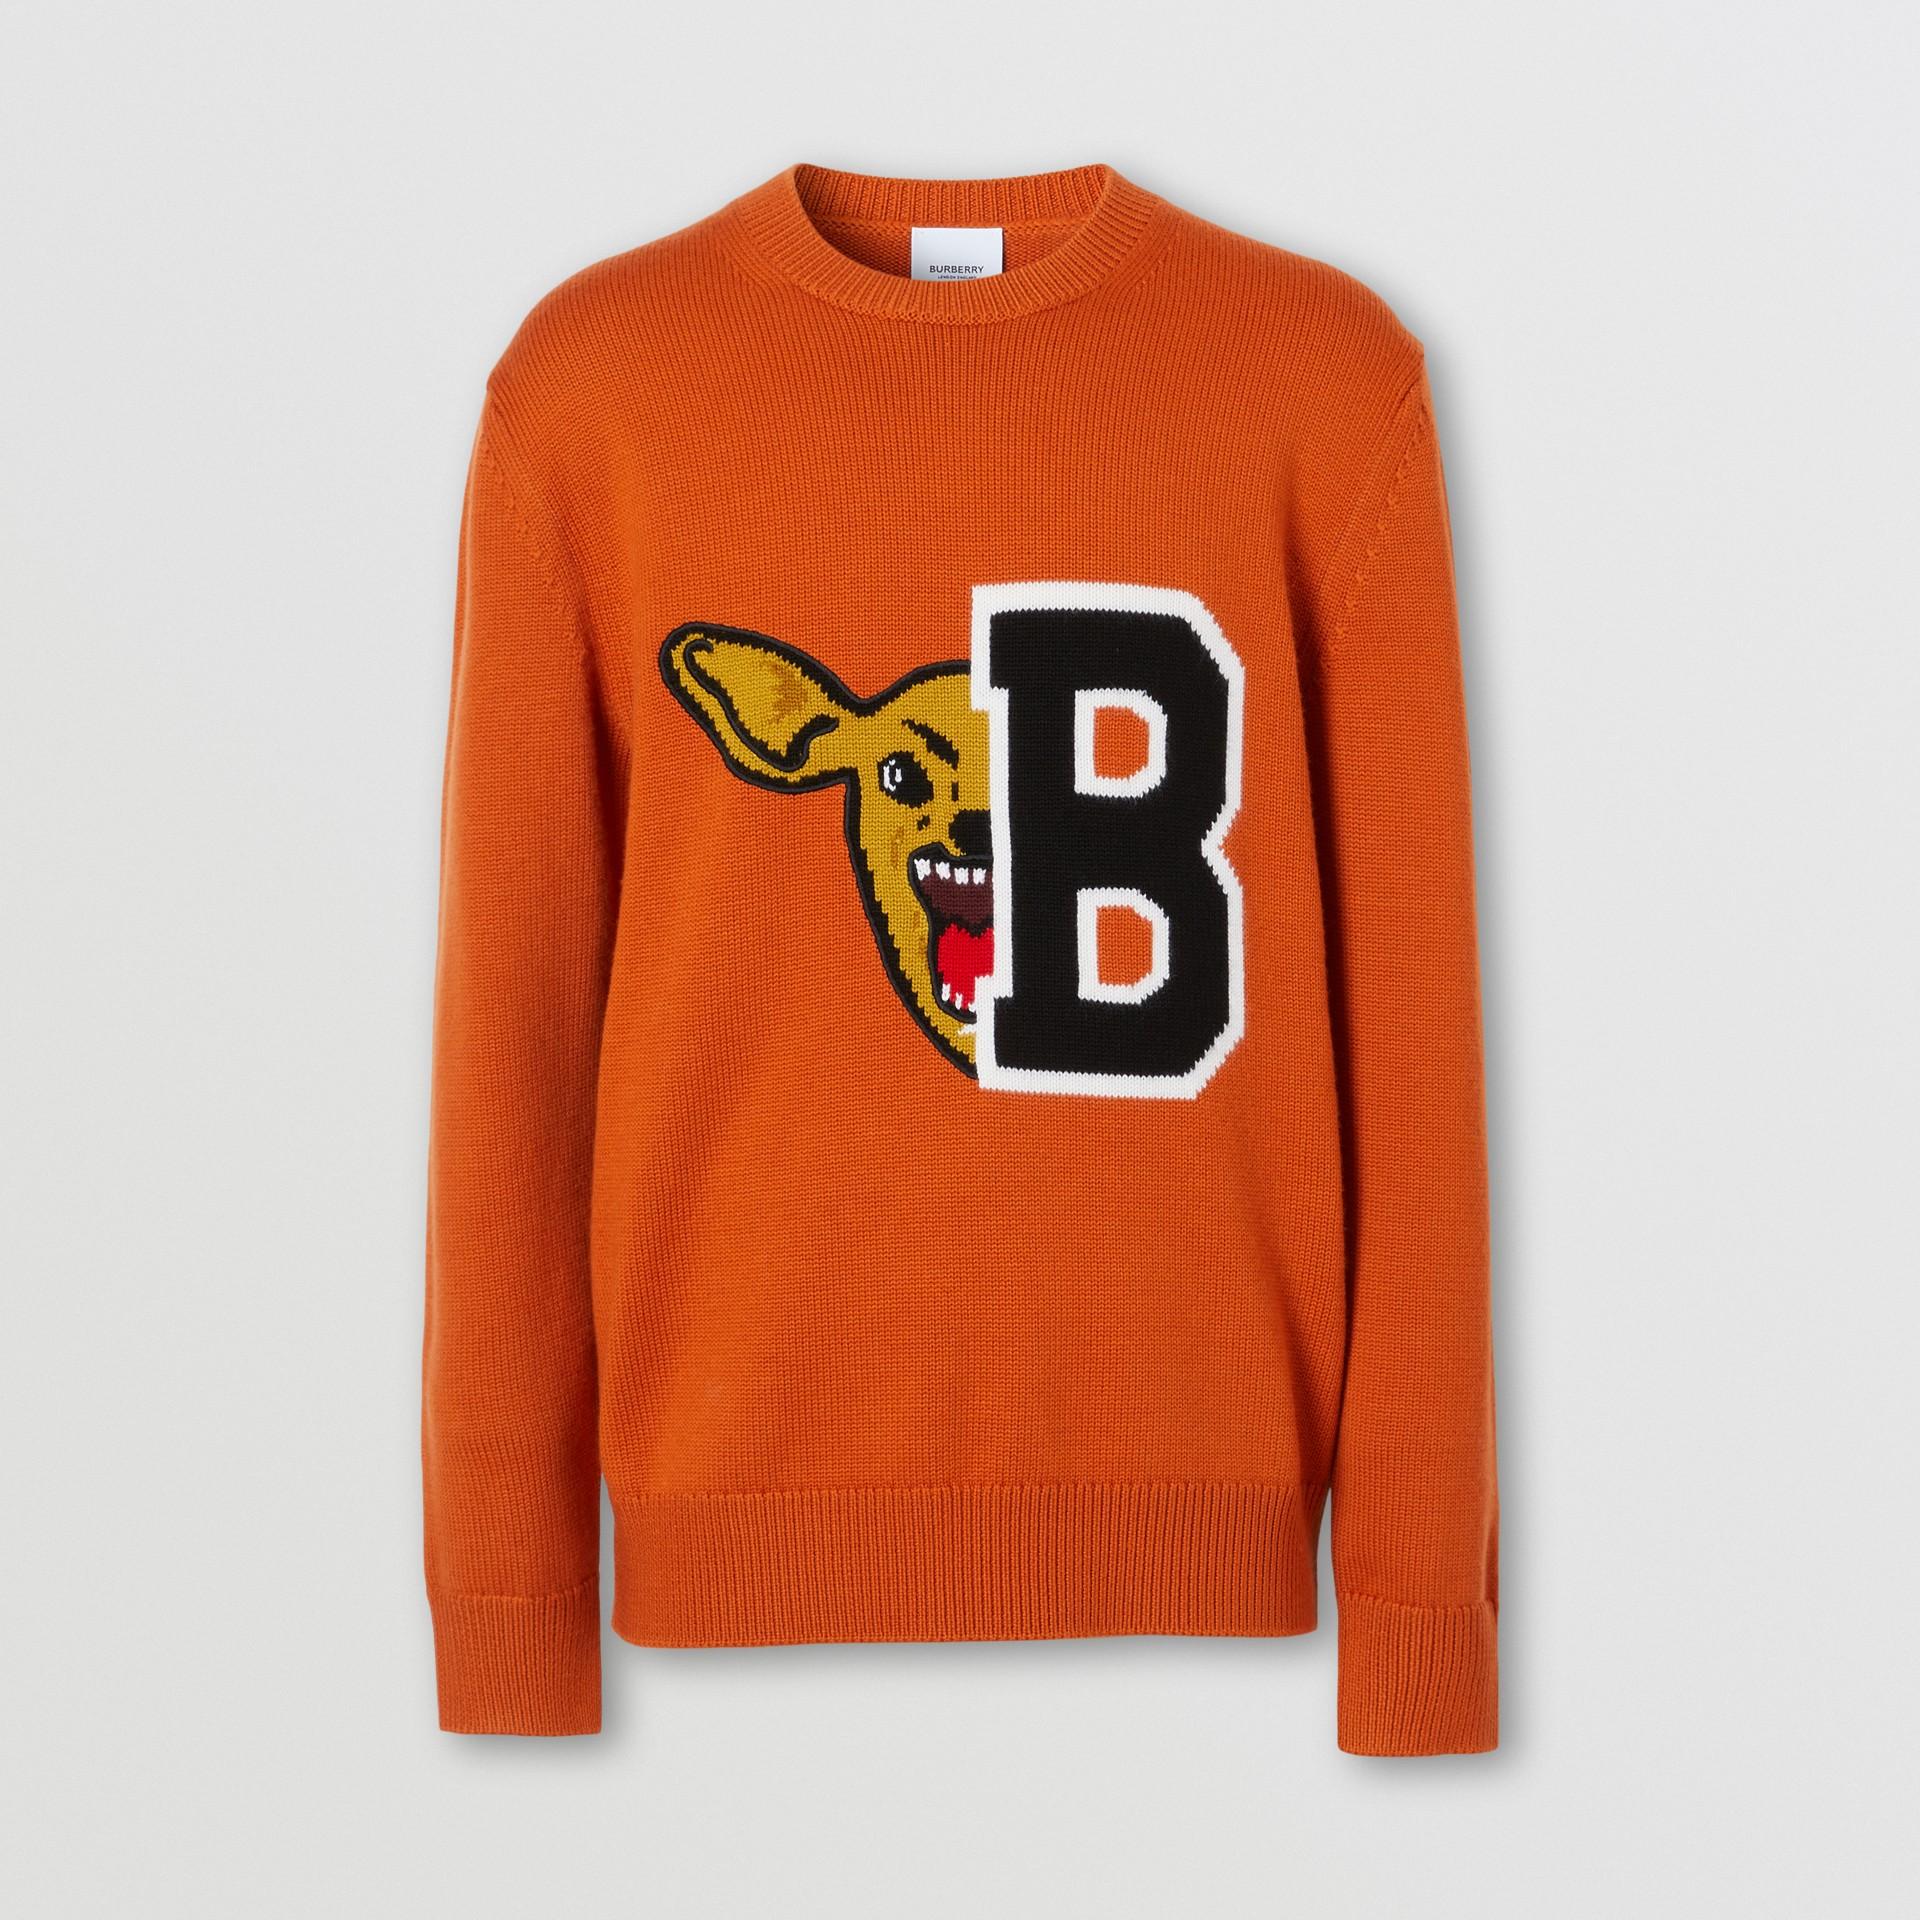 Varsity Graphic Merino Wool Jacquard Sweater in Burnt Orange - Men | Burberry - gallery image 3